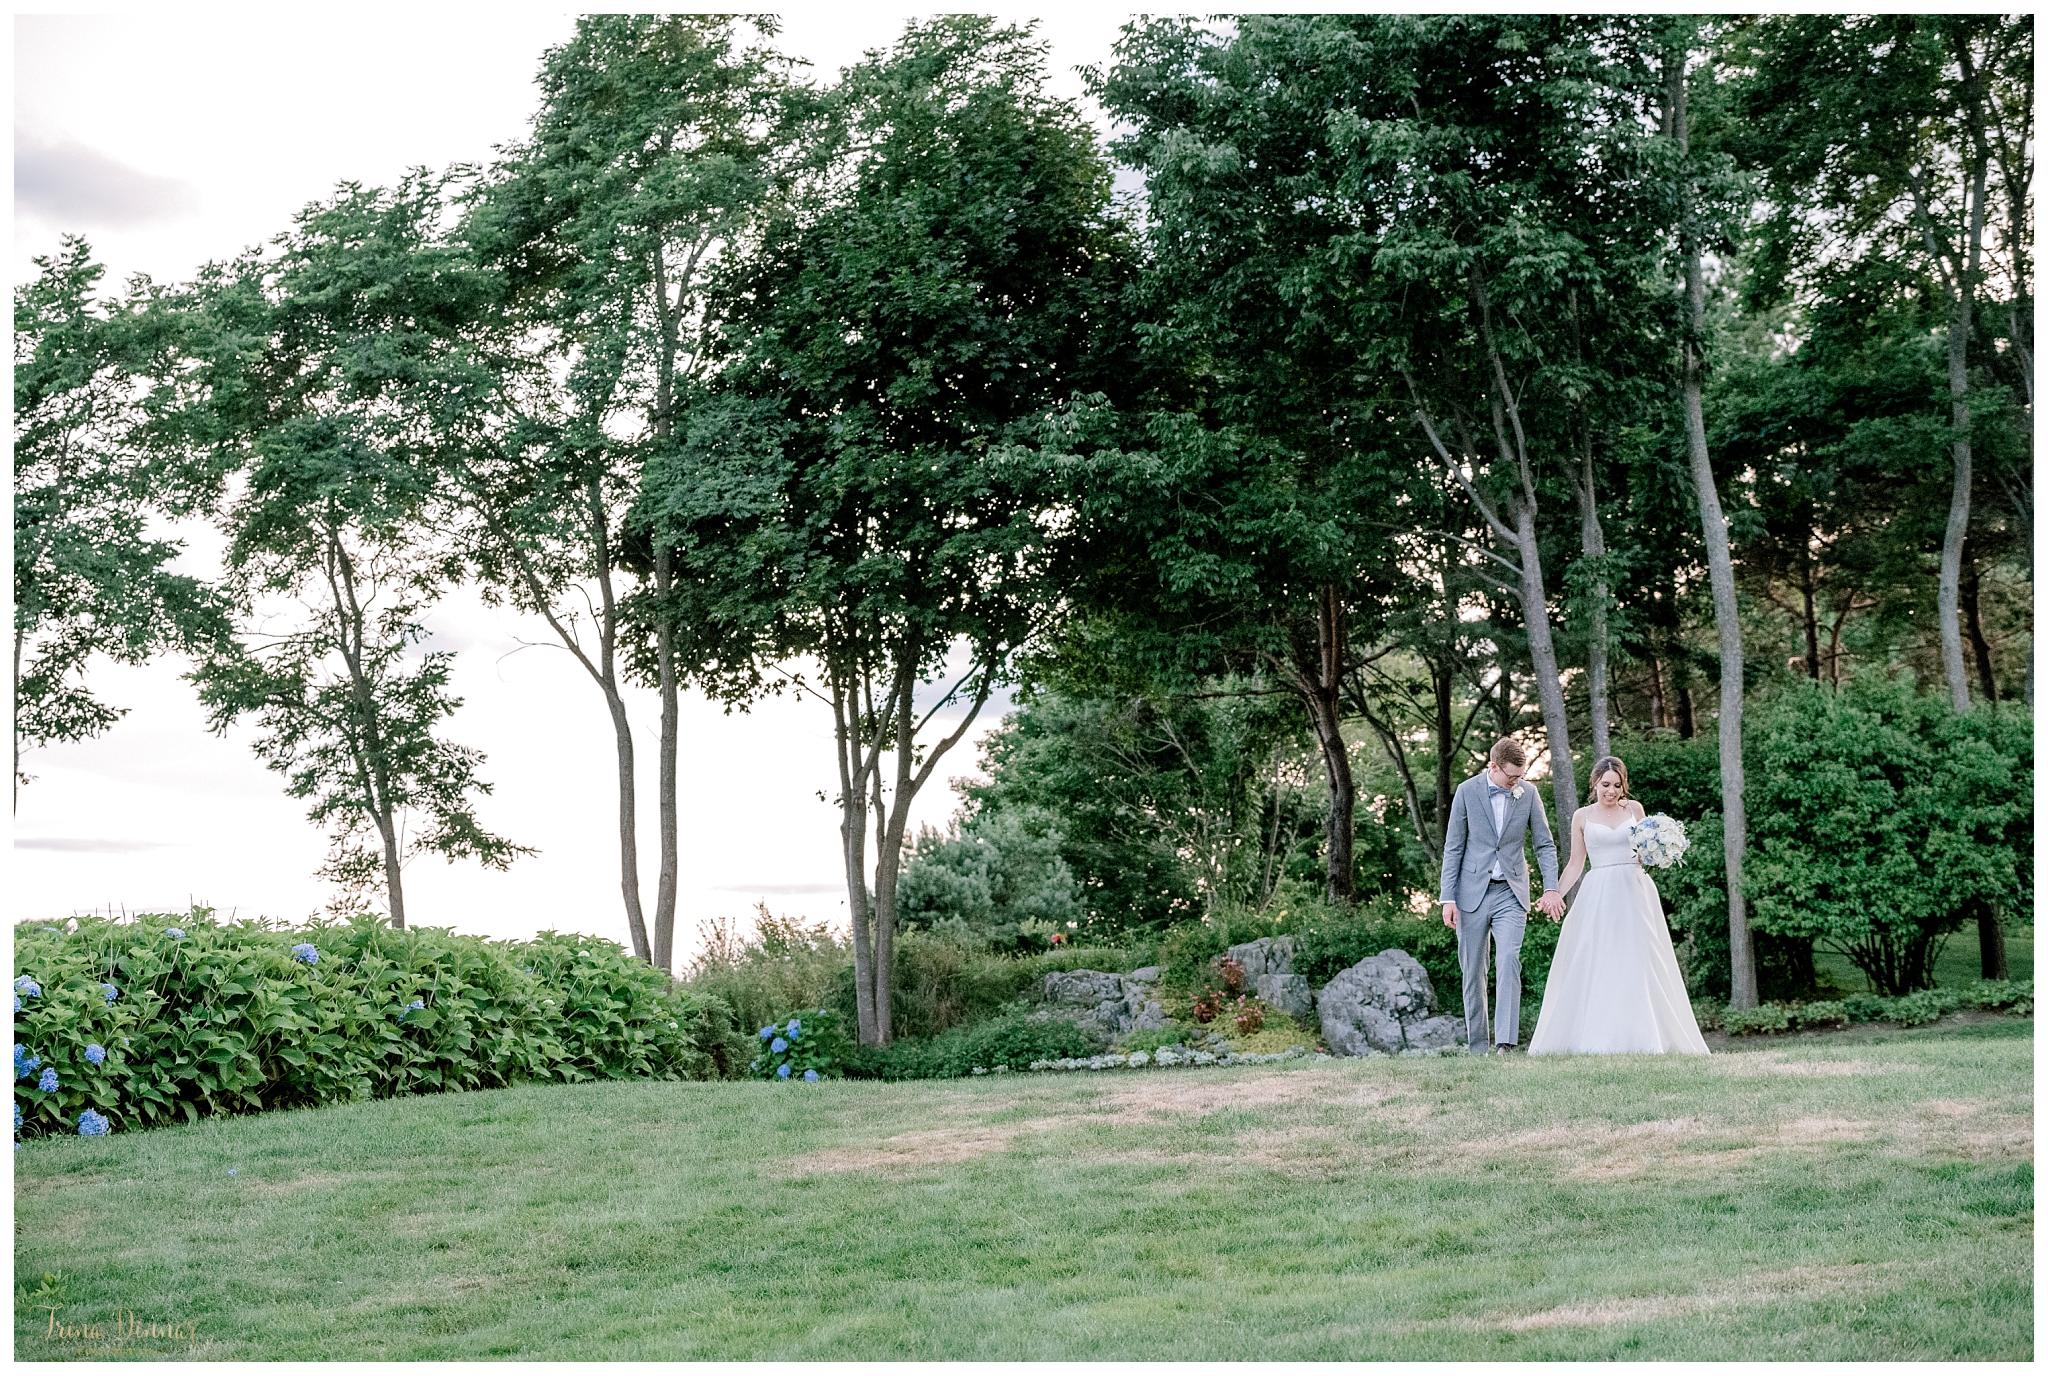 York Maine Wedding at Hartley Mason Reserve